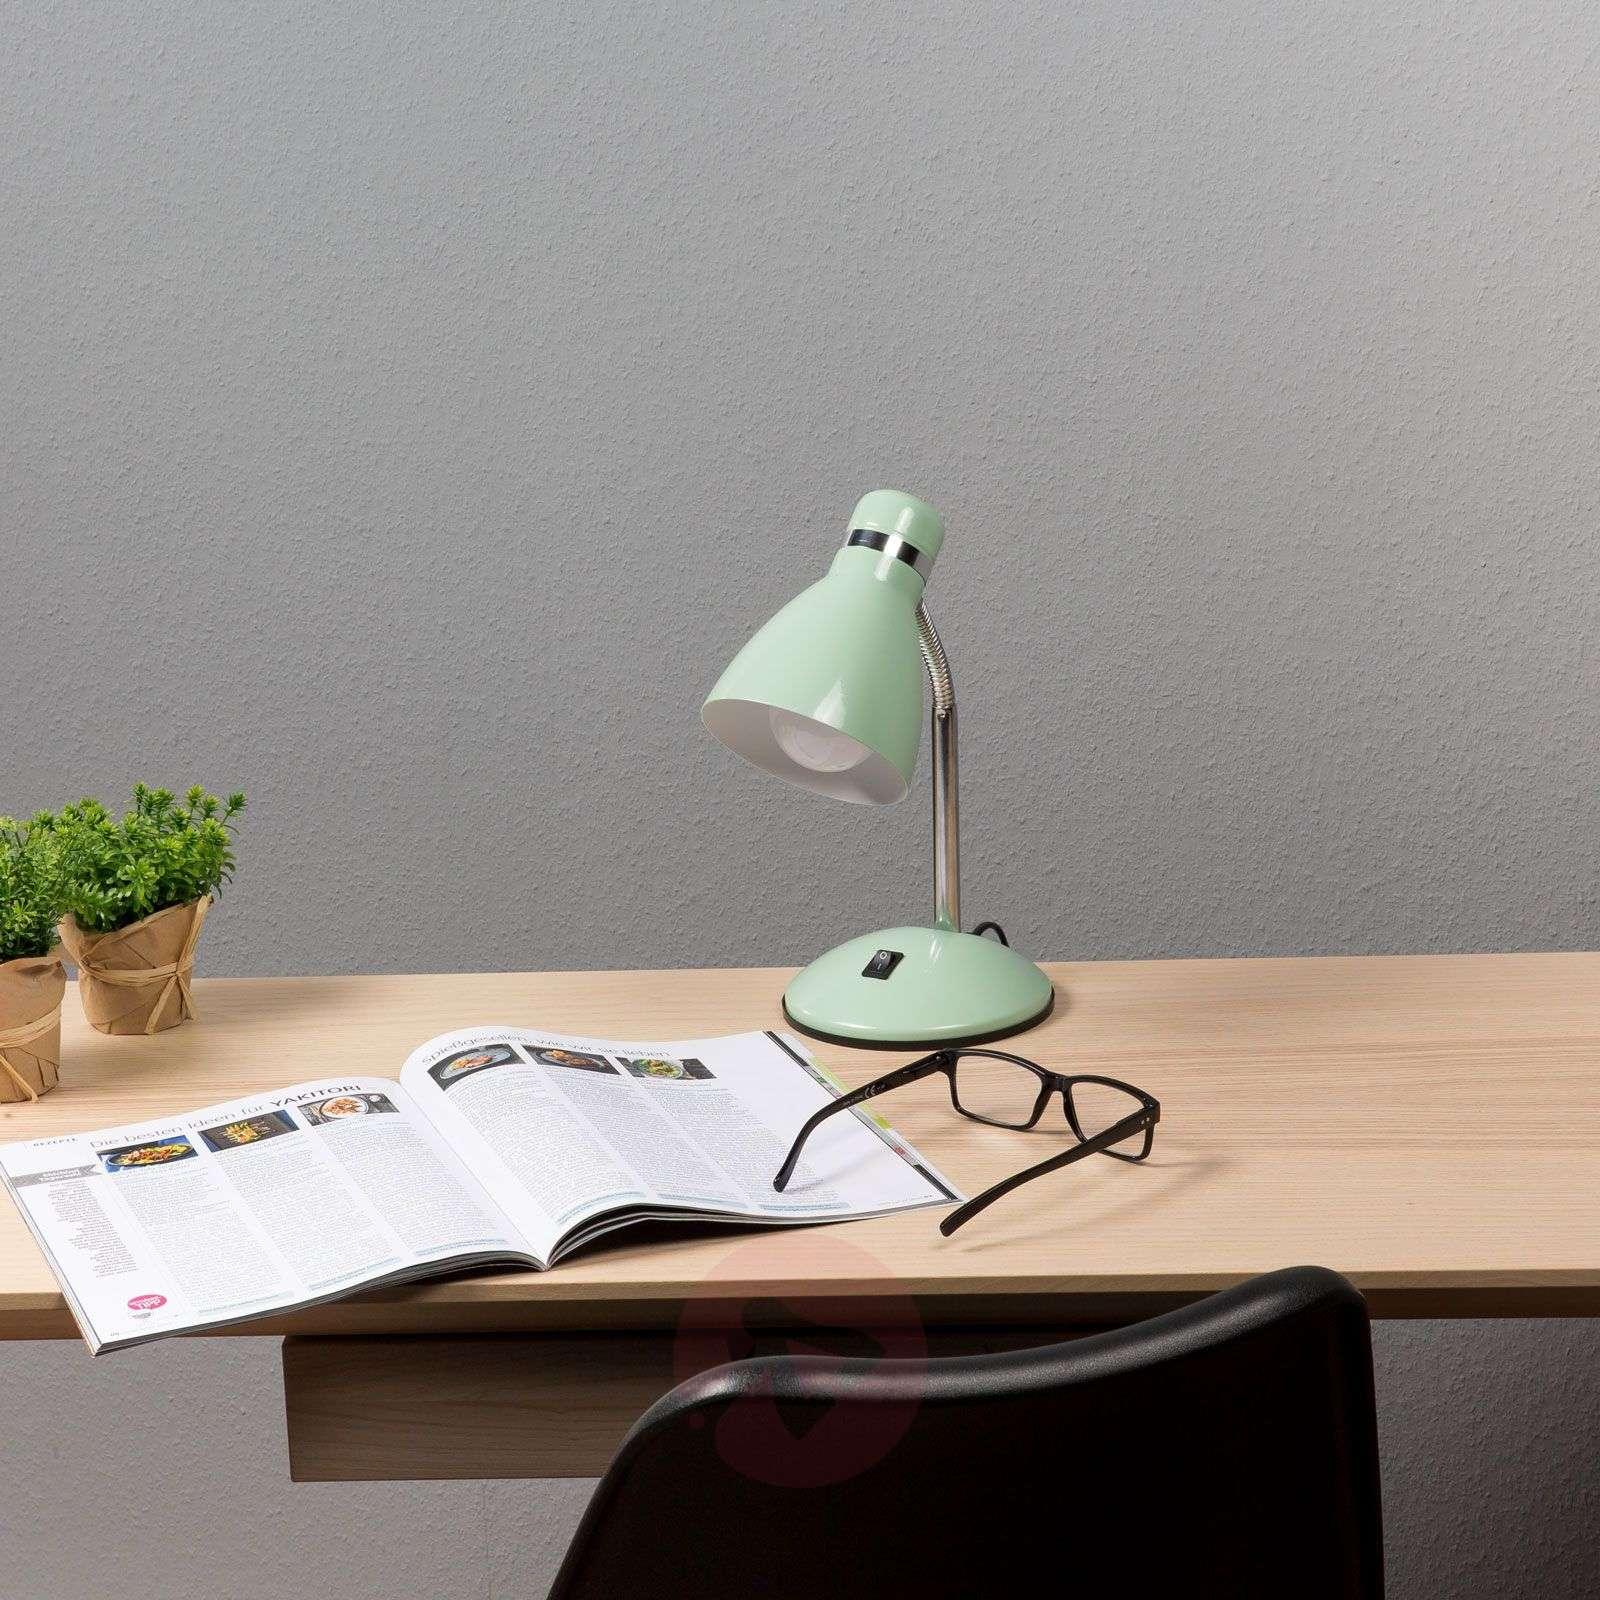 In turquoise trendy desk lamp Studio-3004198-01